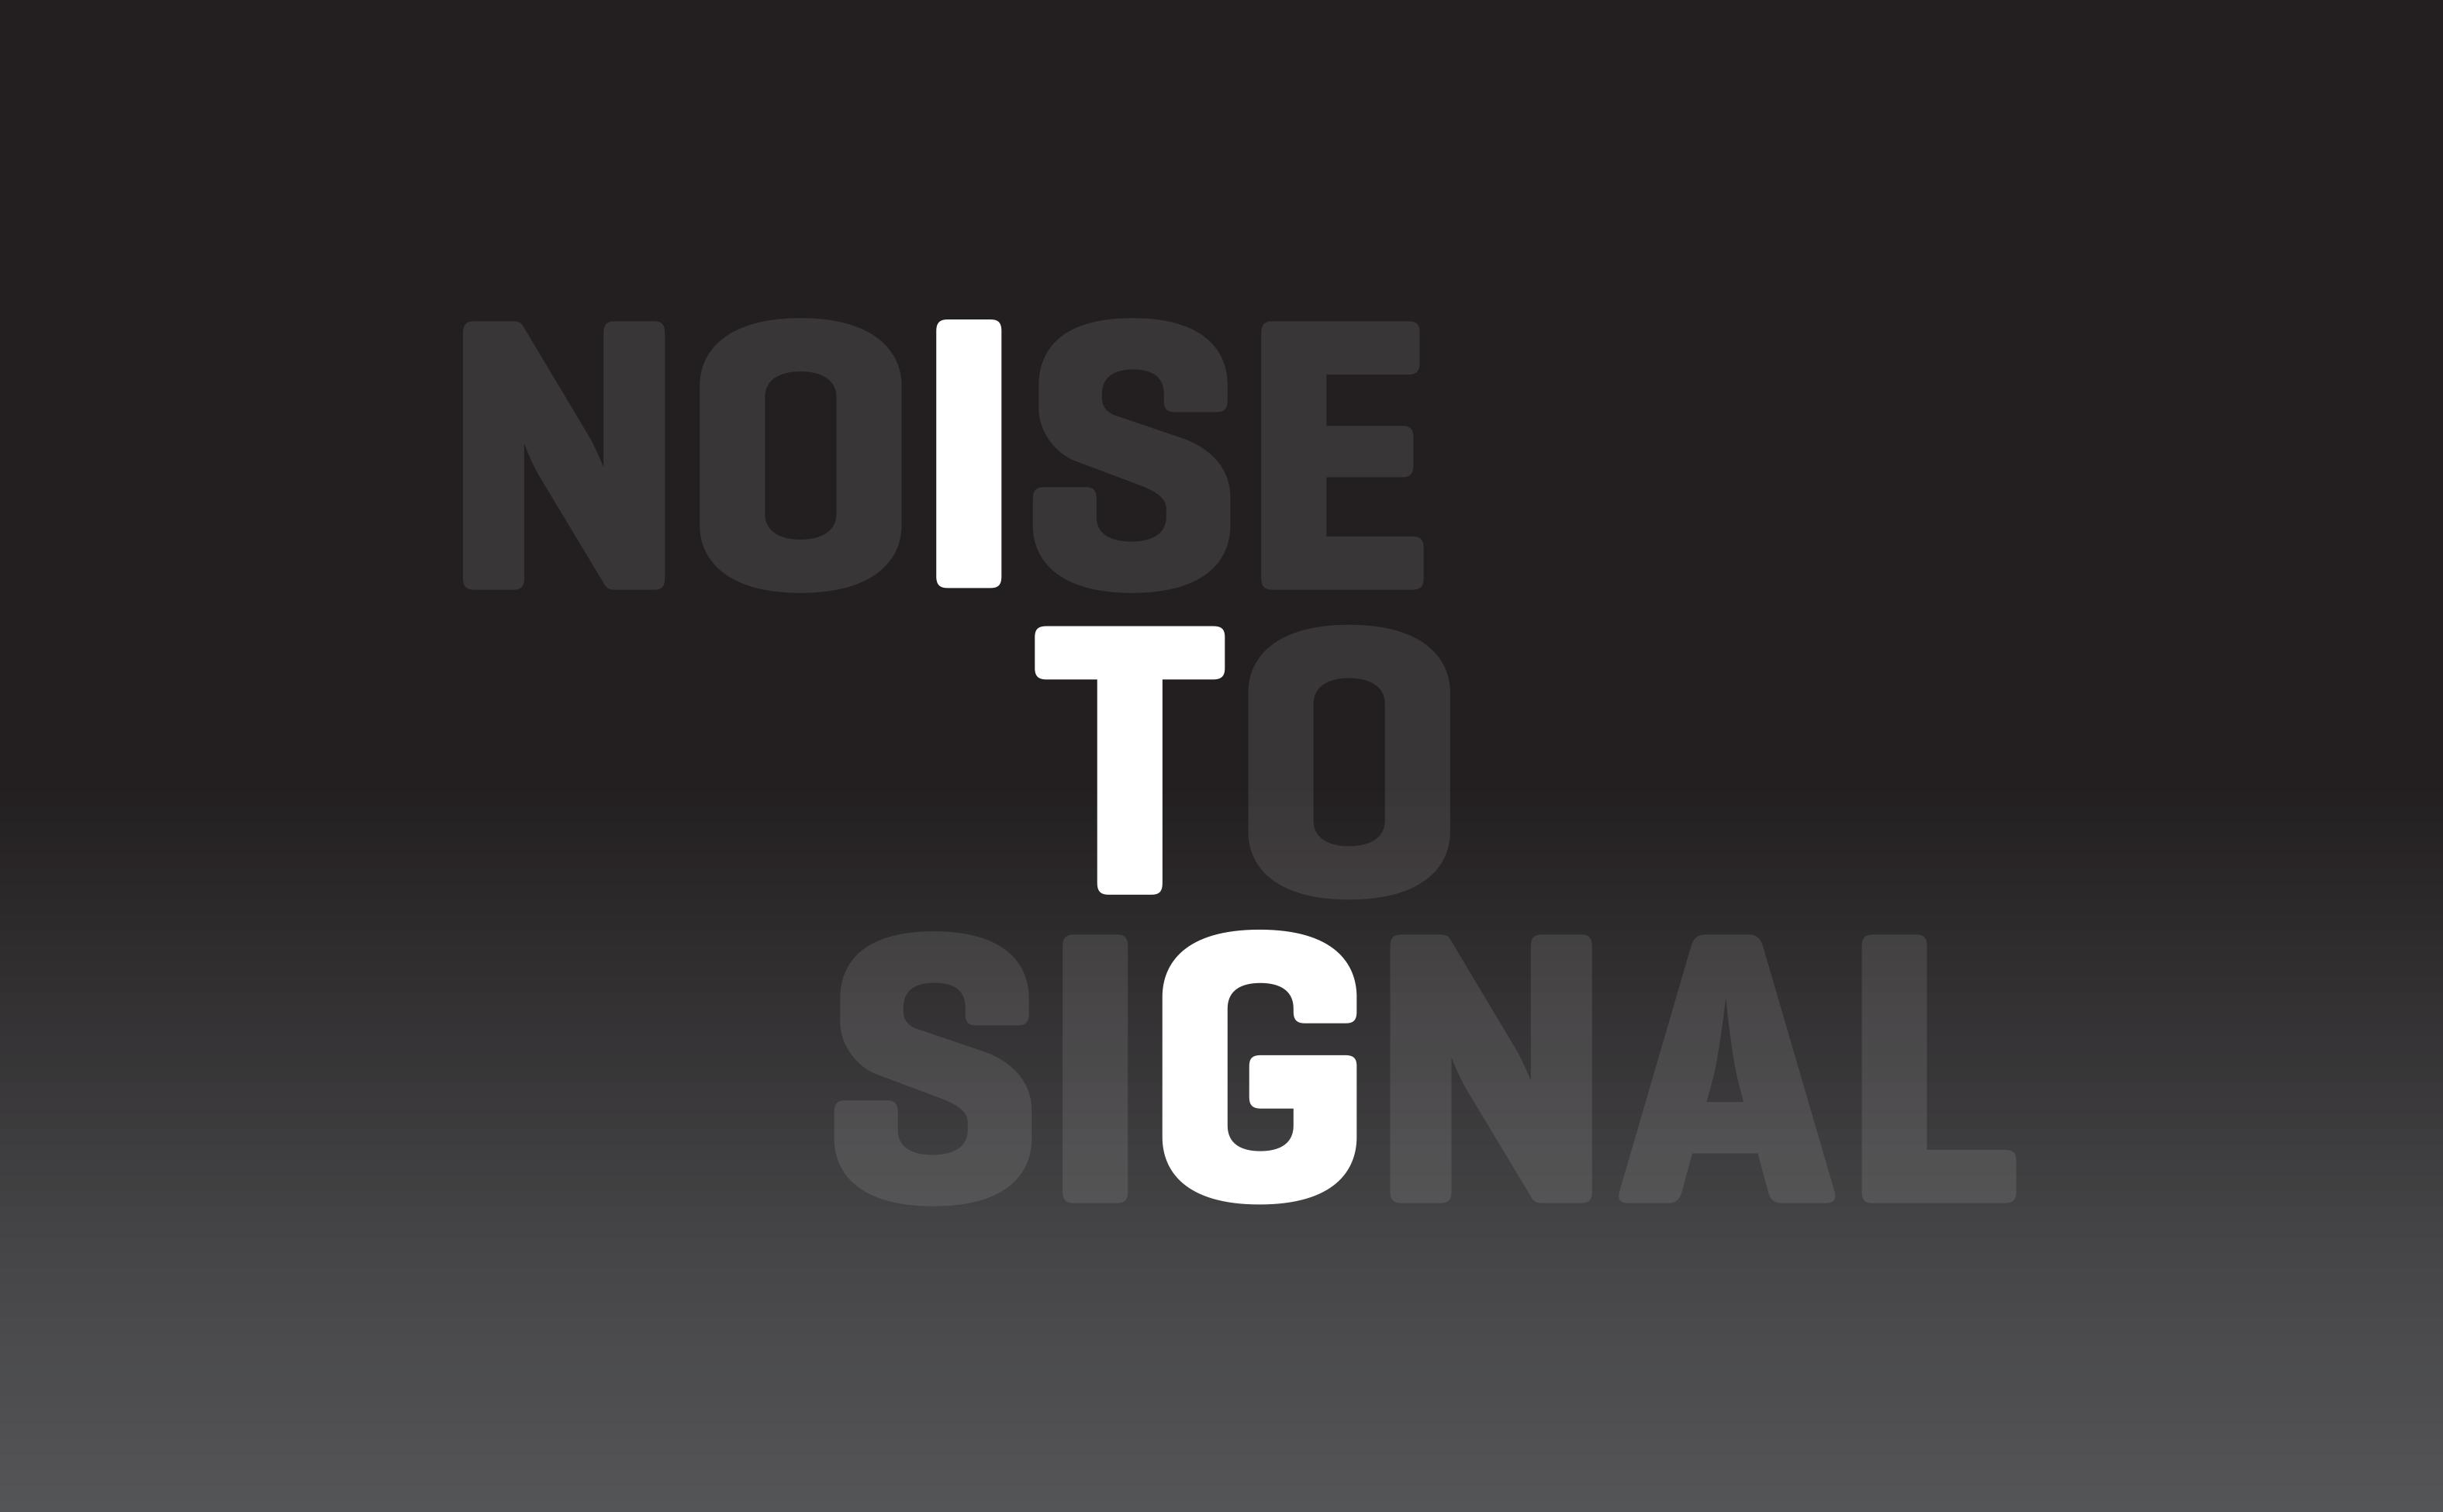 NoiseToSignal